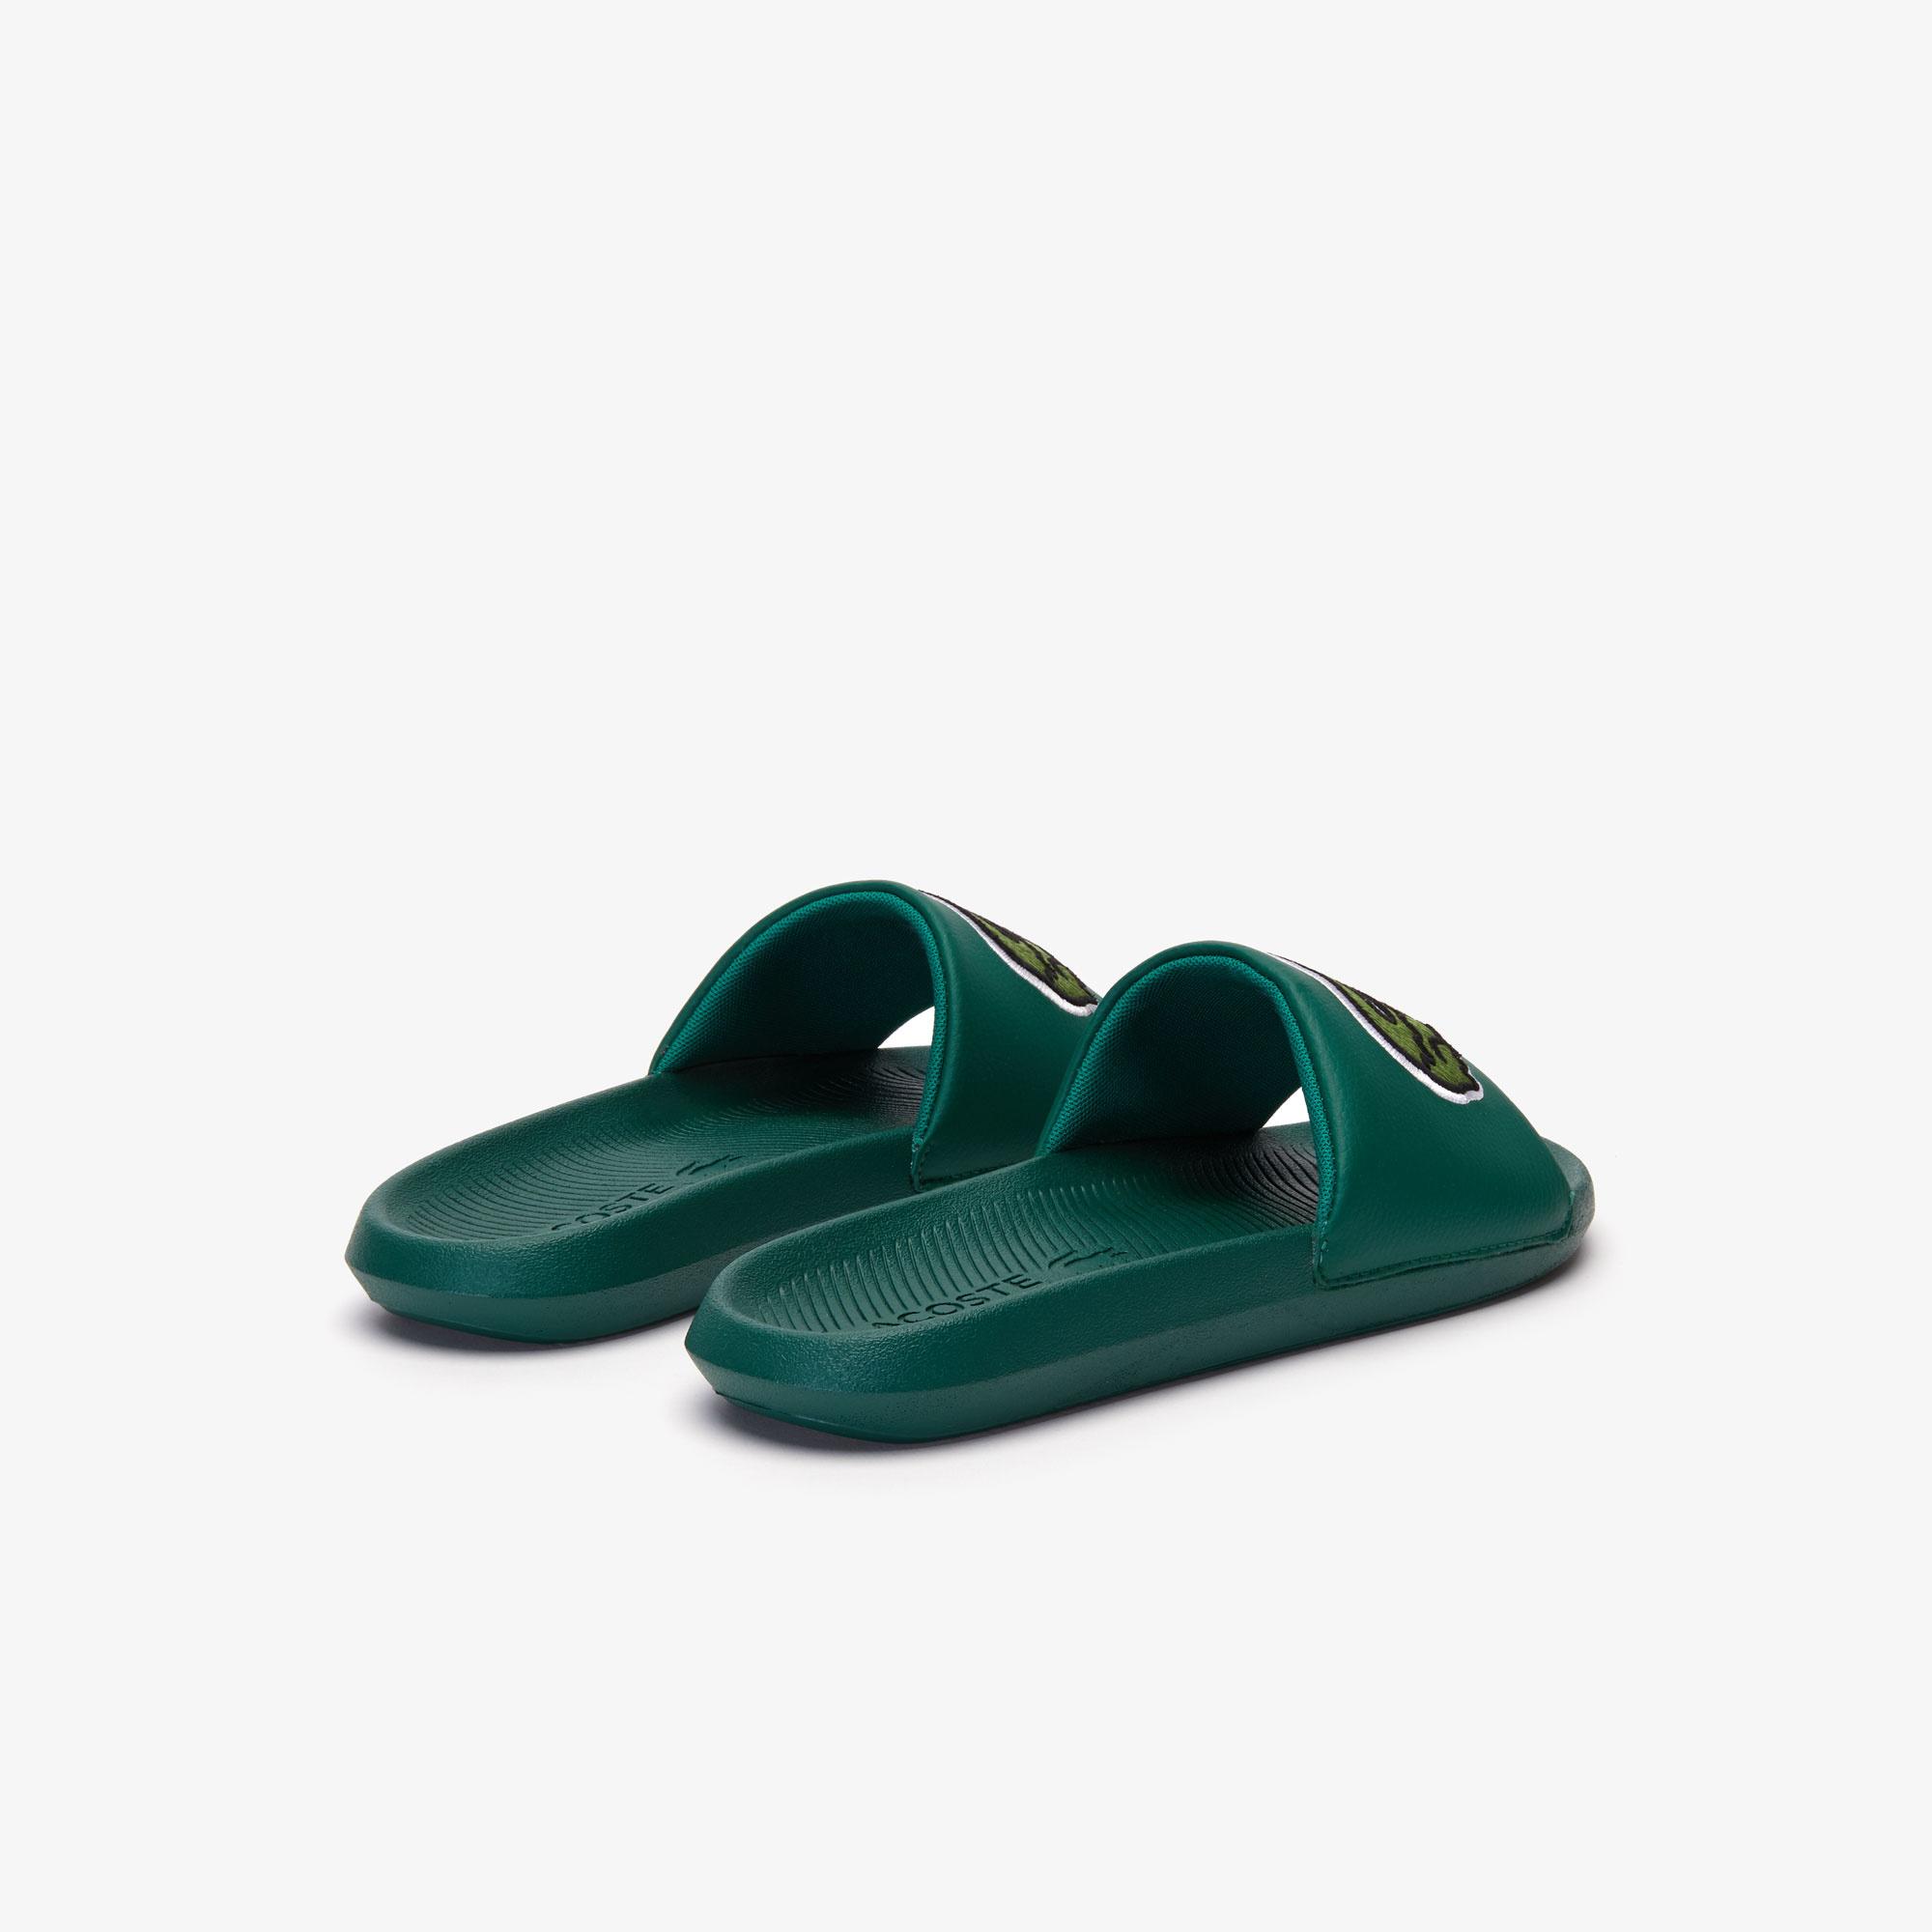 Croco Slide Groen / Groen